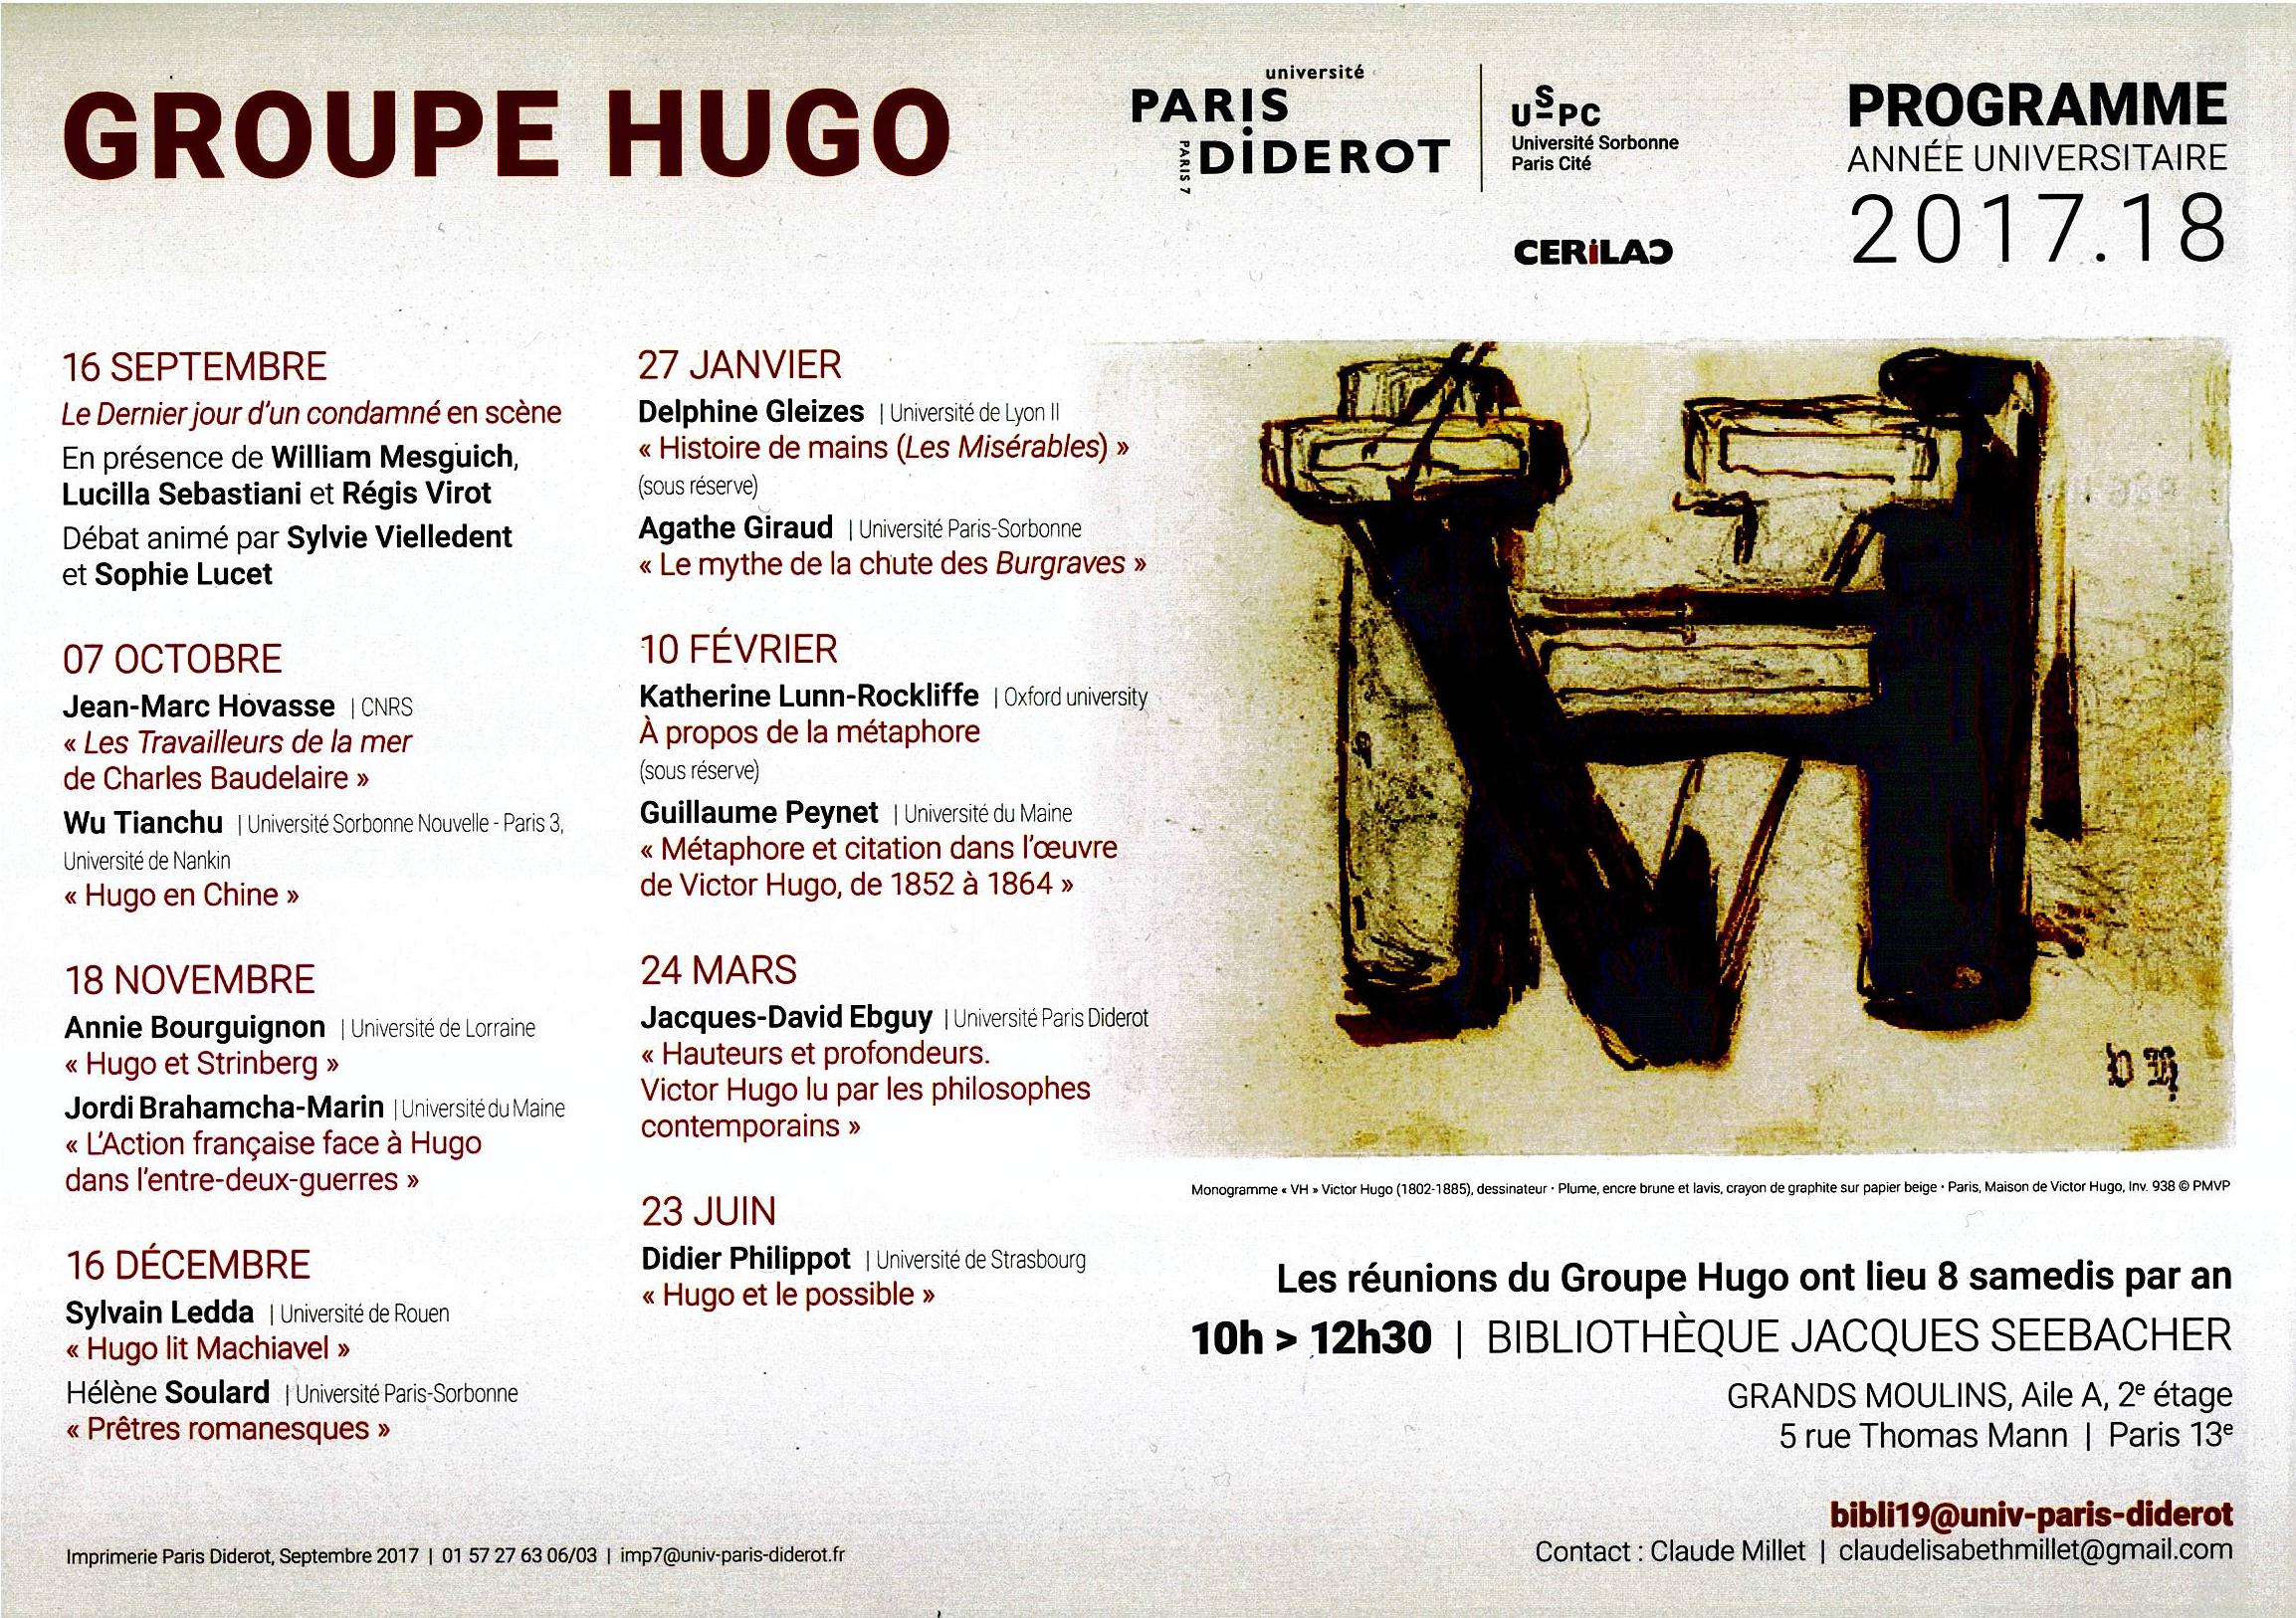 Programme Groupe Hugo 2017-2018